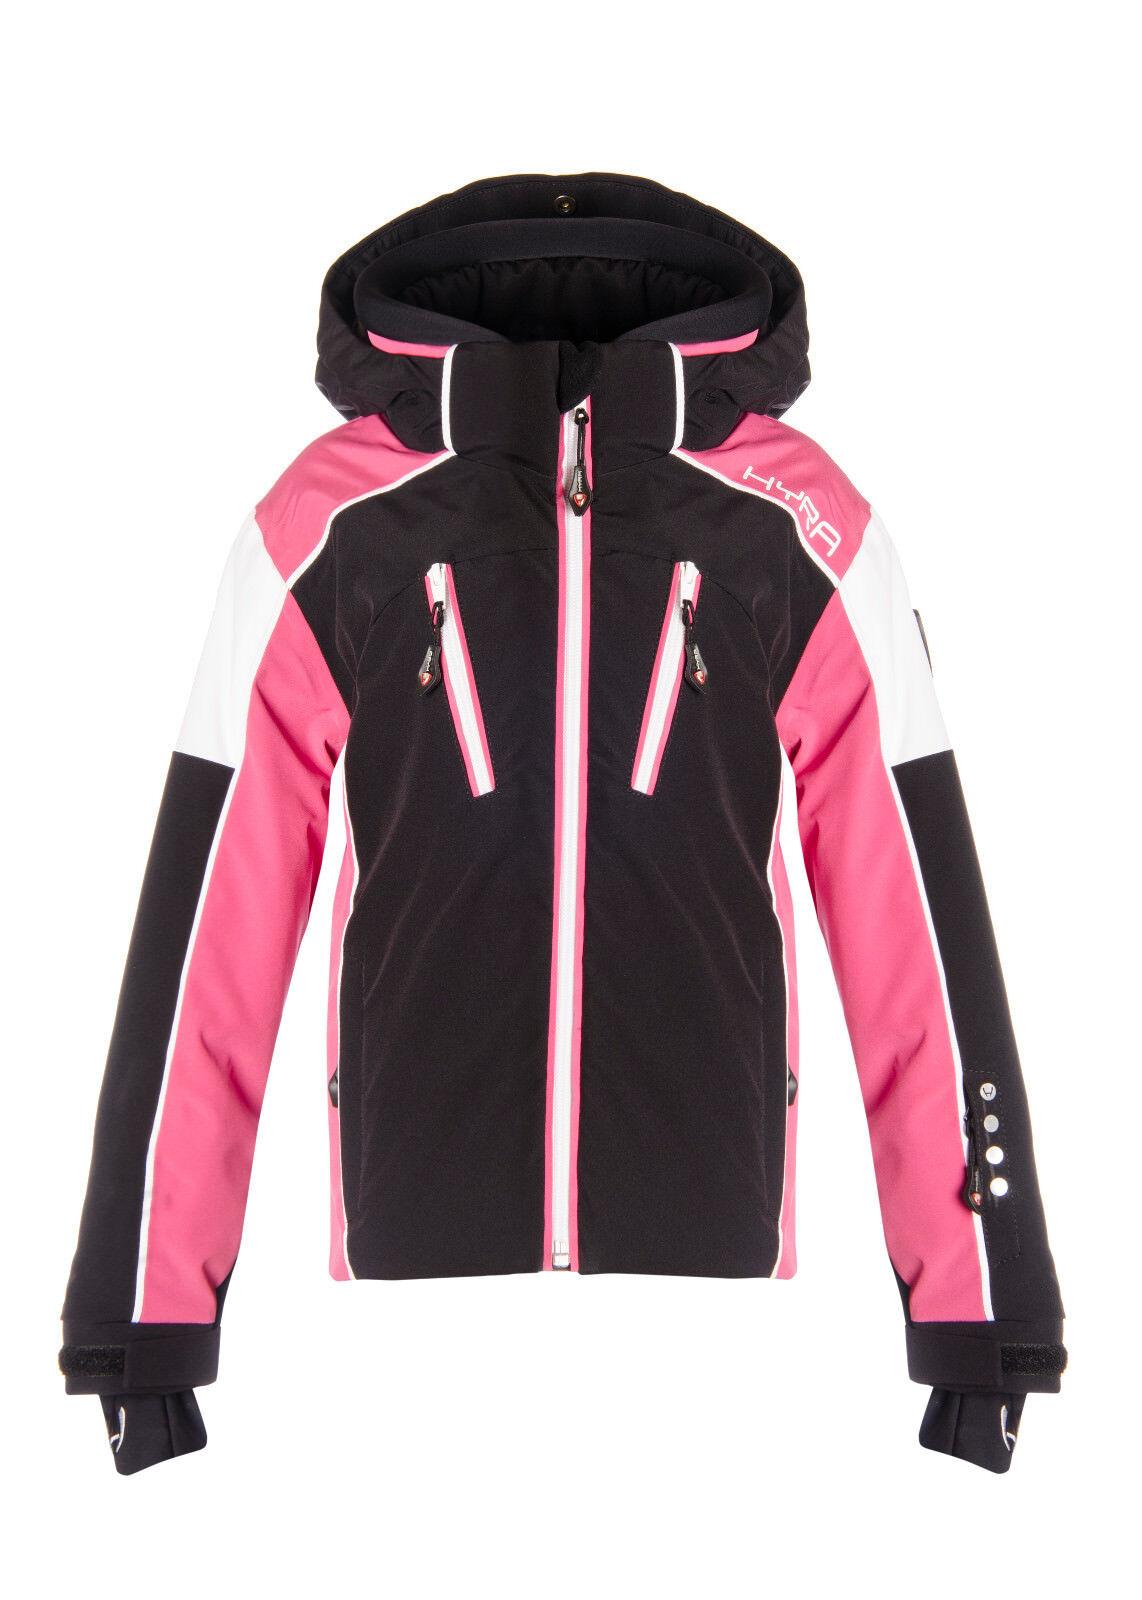 Hyra Coira giacca sci invernale calda ragazza HJG15449 Universal Evolution 2018